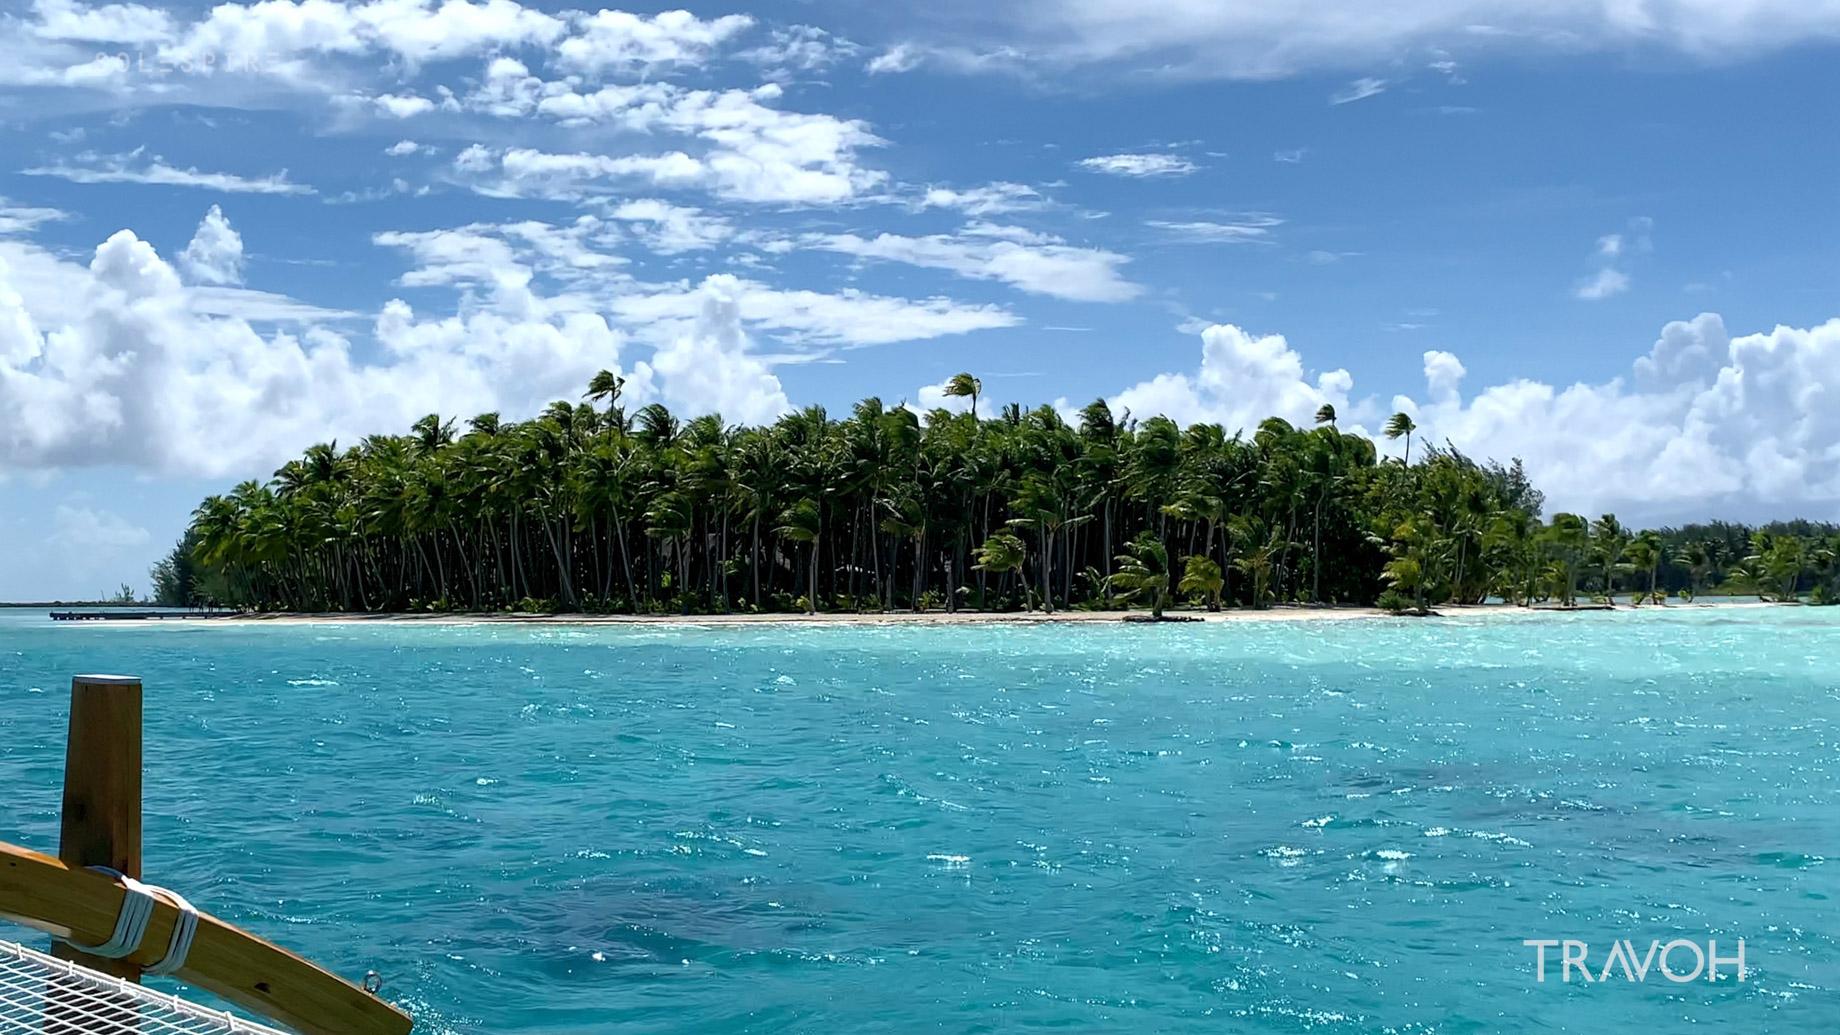 Arrival - Motu Tane Private Island Vacation - Bora Bora, French Polynesia - Travel